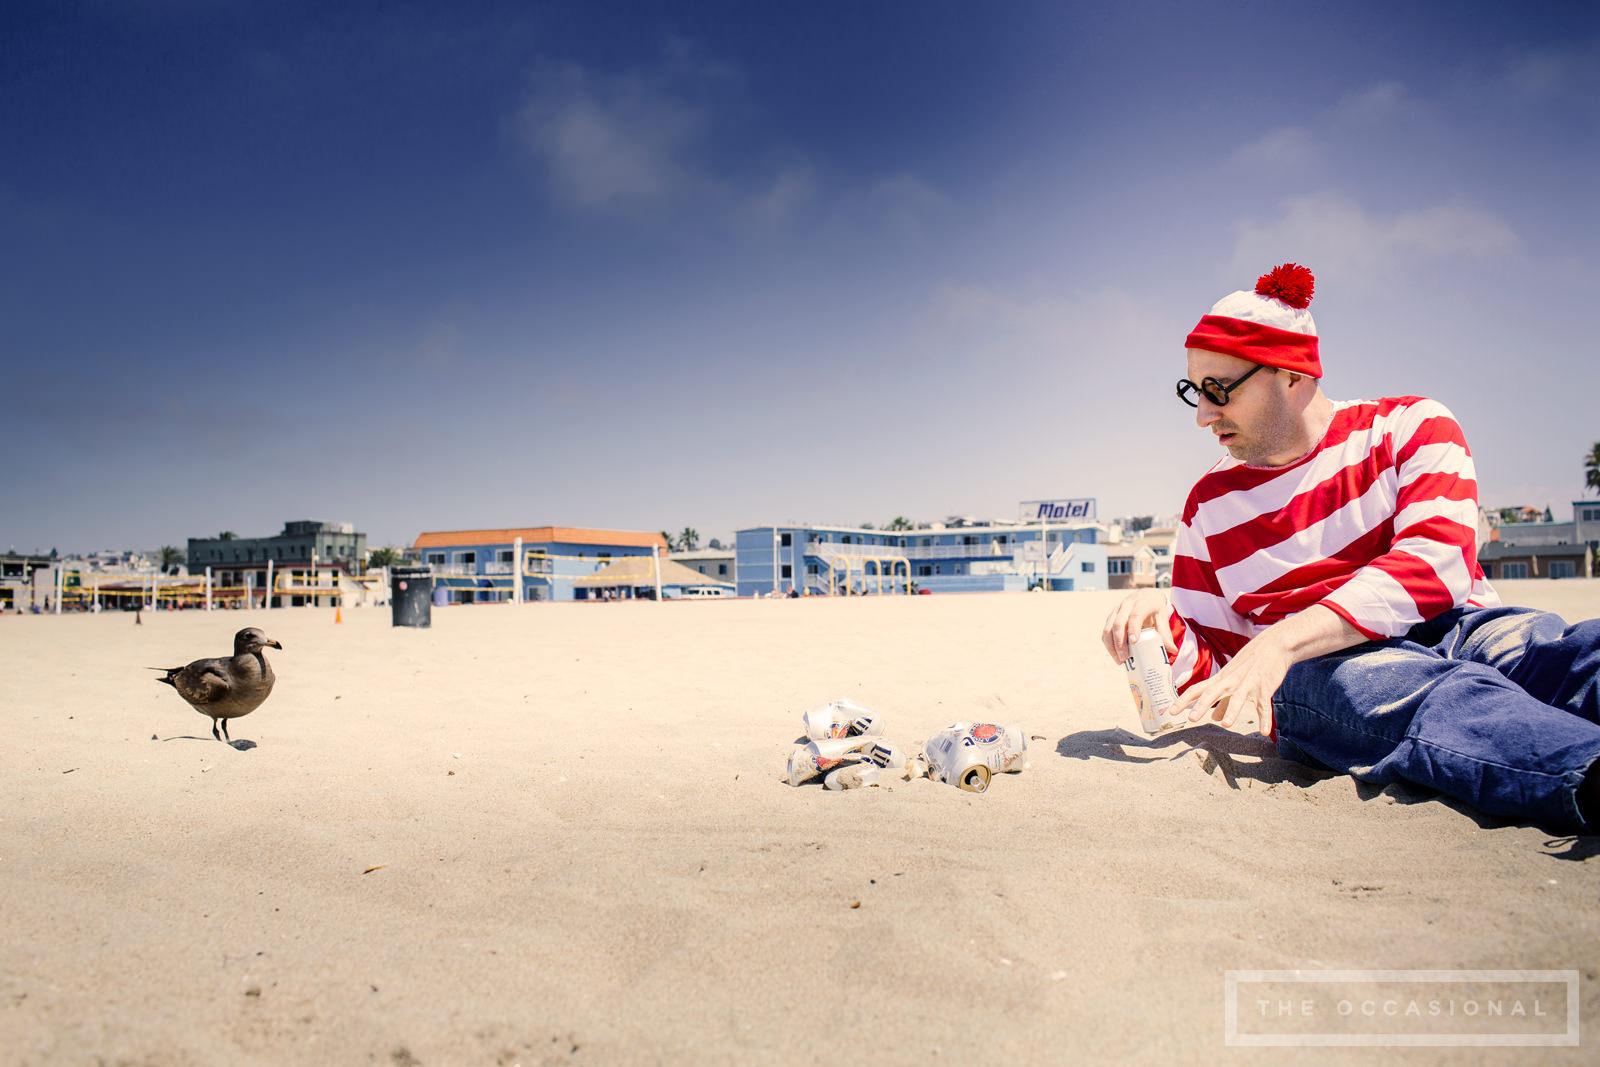 TonyHale-TheOccasional-Beach1.jpg